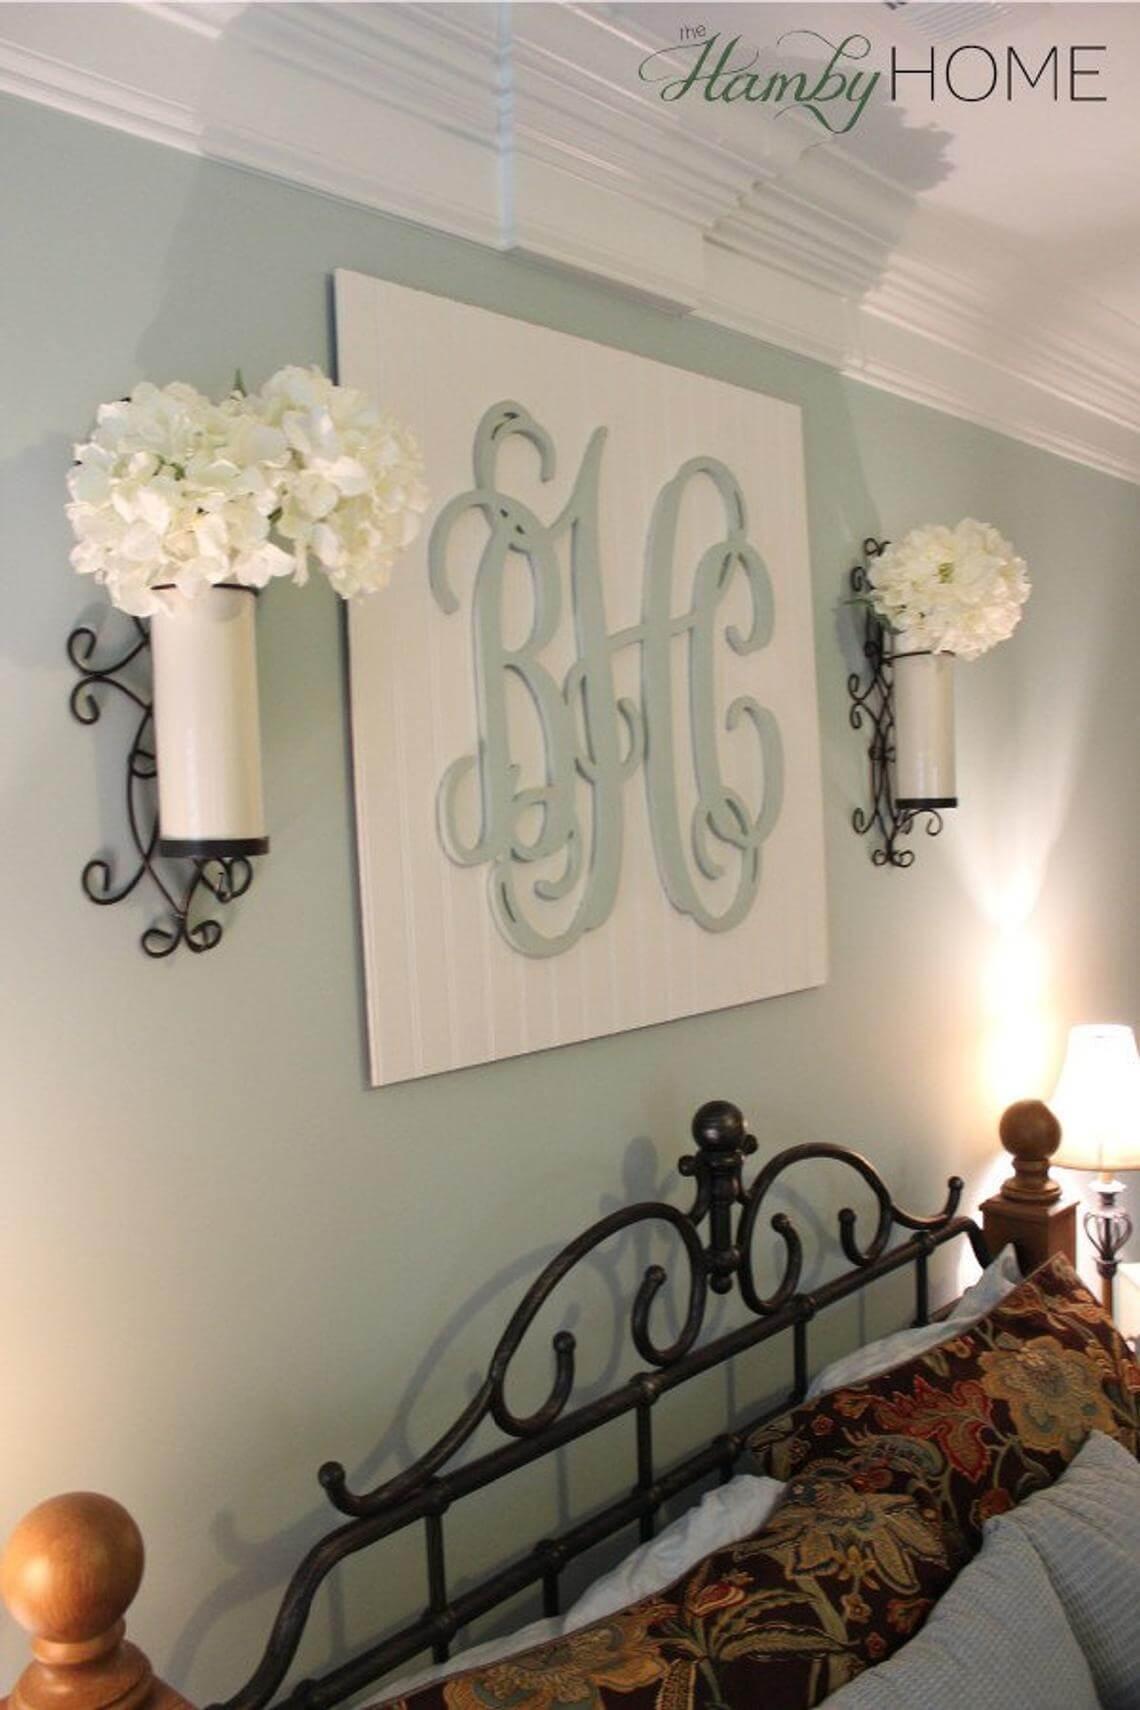 Simply Elegant Scrolls and Monogrammed Master Bedroom